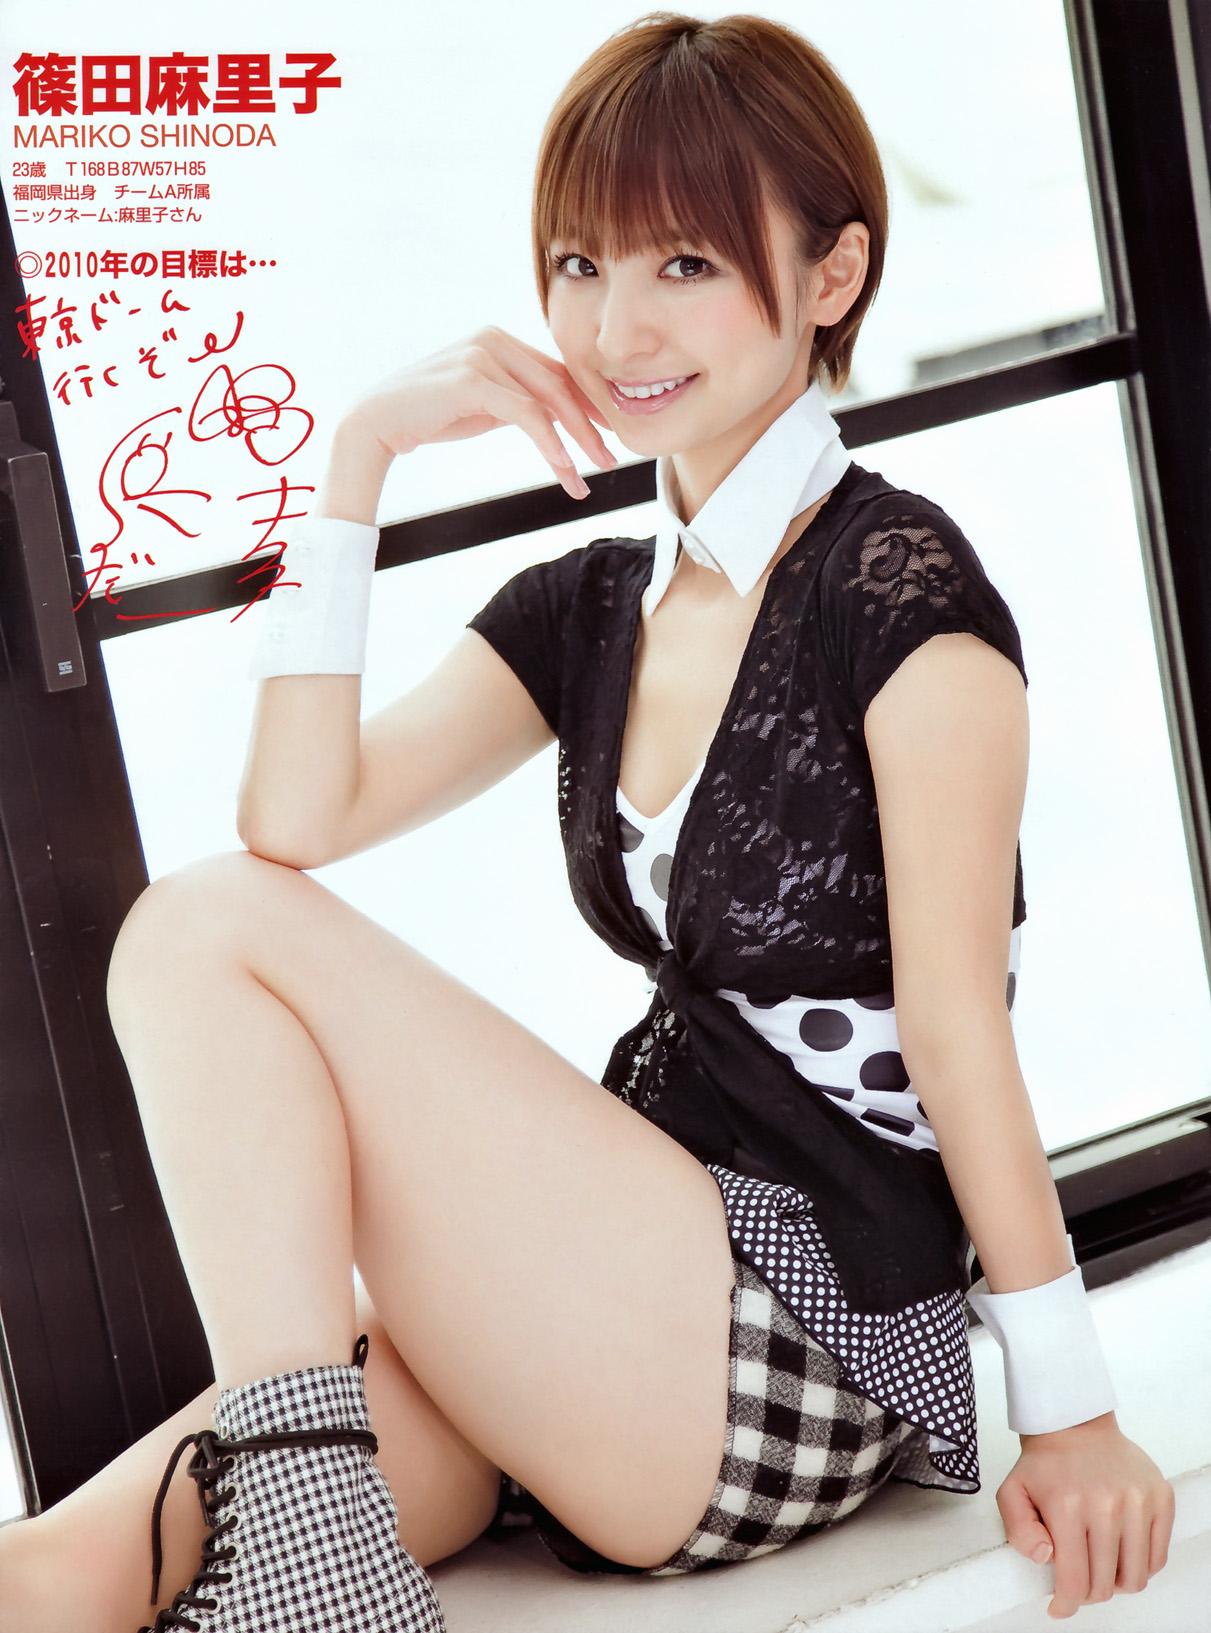 Mariko Shinoda Android Iphone Wallpaper 38521 Asiachan